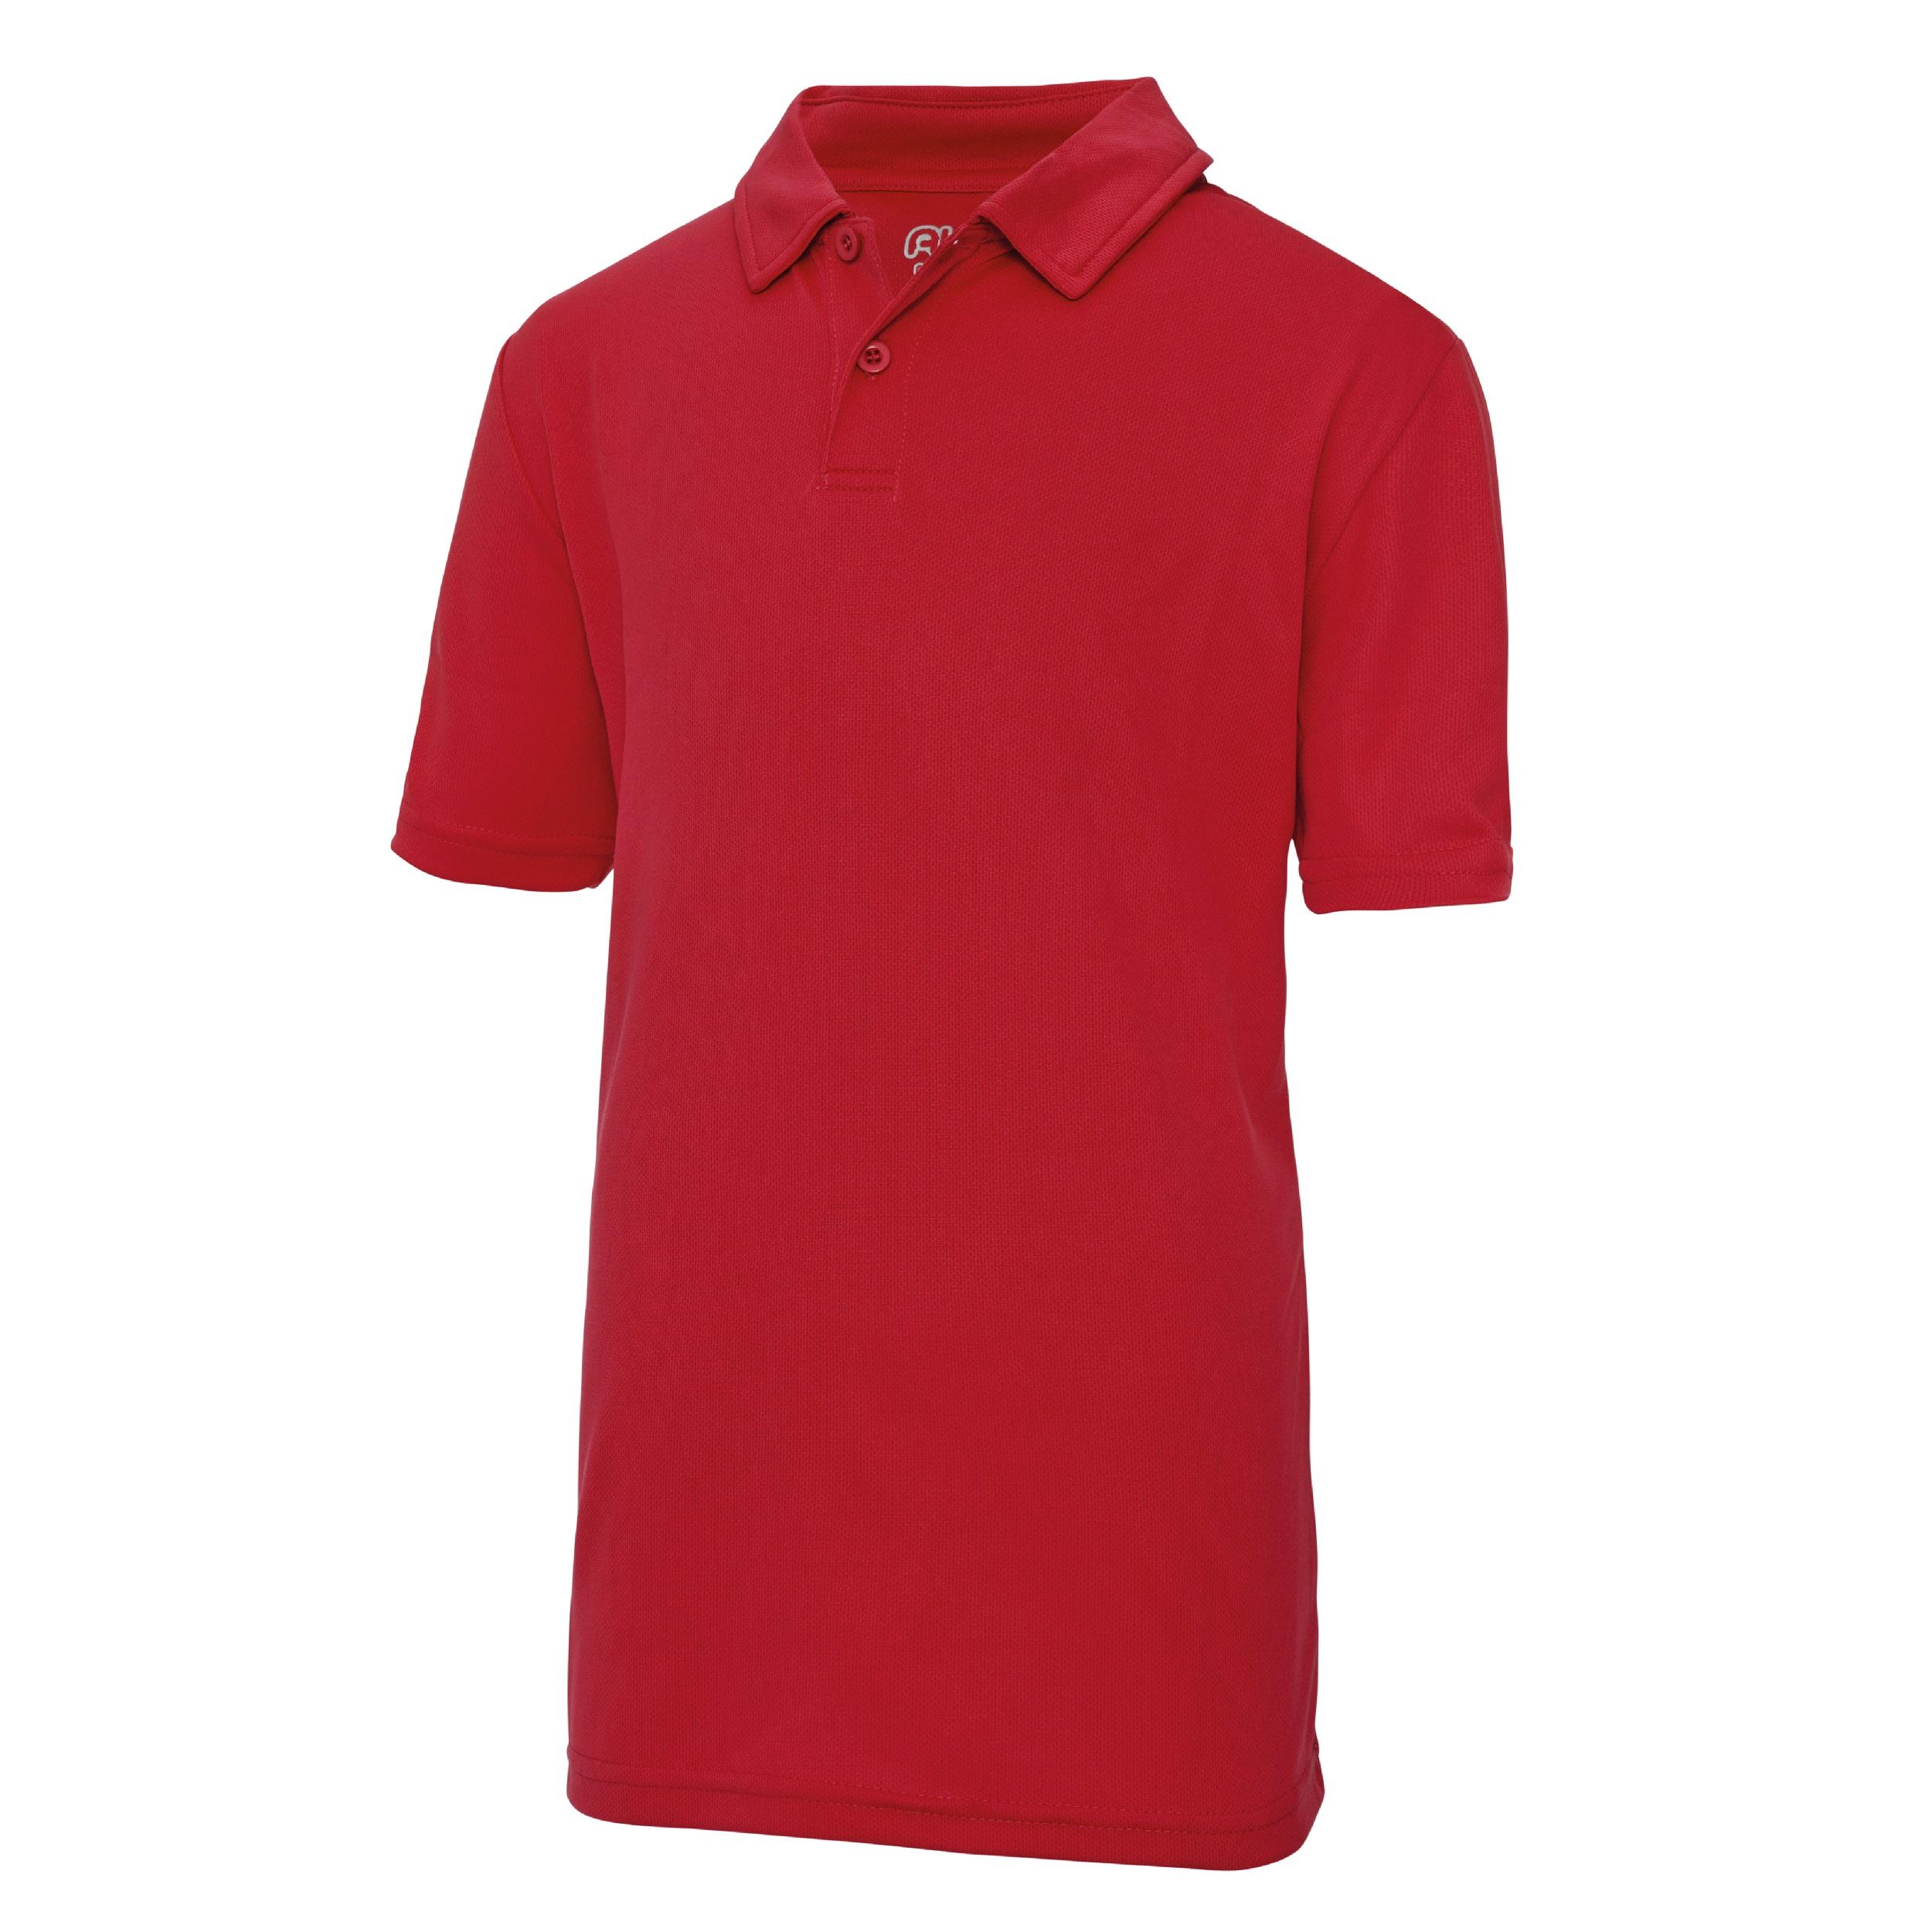 8f411c5bb Home Polo Shirts JC40J Kids cool polo. Return to Previous Page. prev